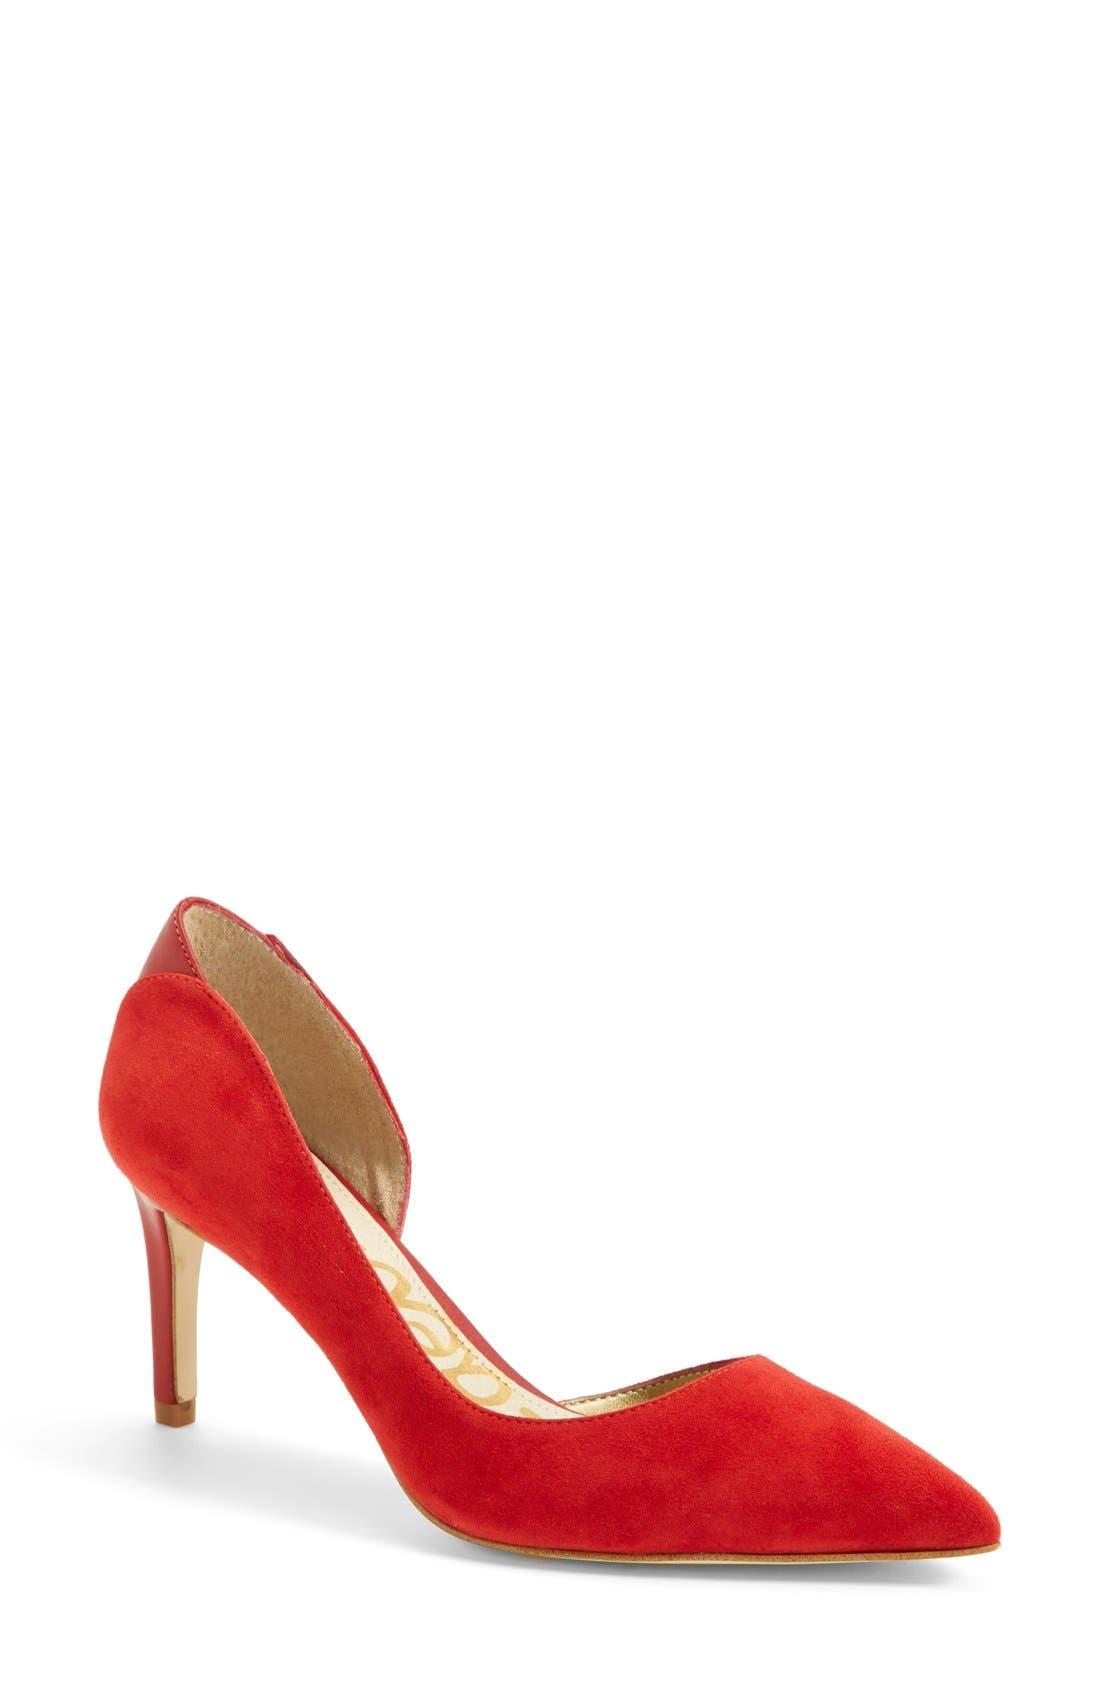 Alternate Image 1 Selected - Sam Edelman 'Onyx' Half d'Orsay Pointy Toe Pump (Women)